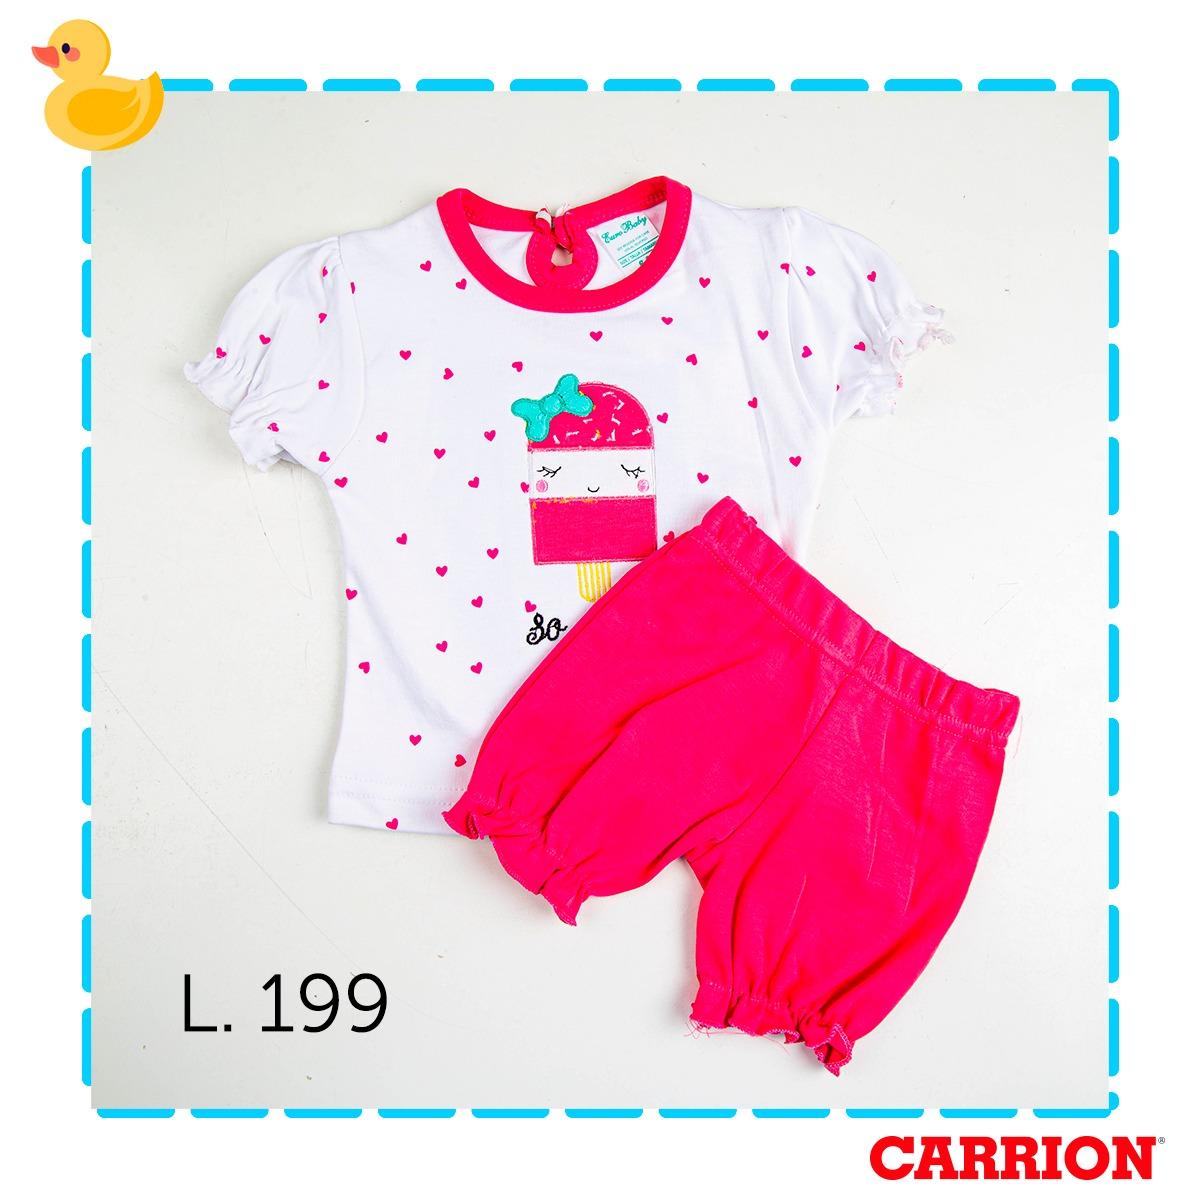 Hermosos atuendos para tus bebés #tiendascarrion https://t.co/yi1h4iZX35